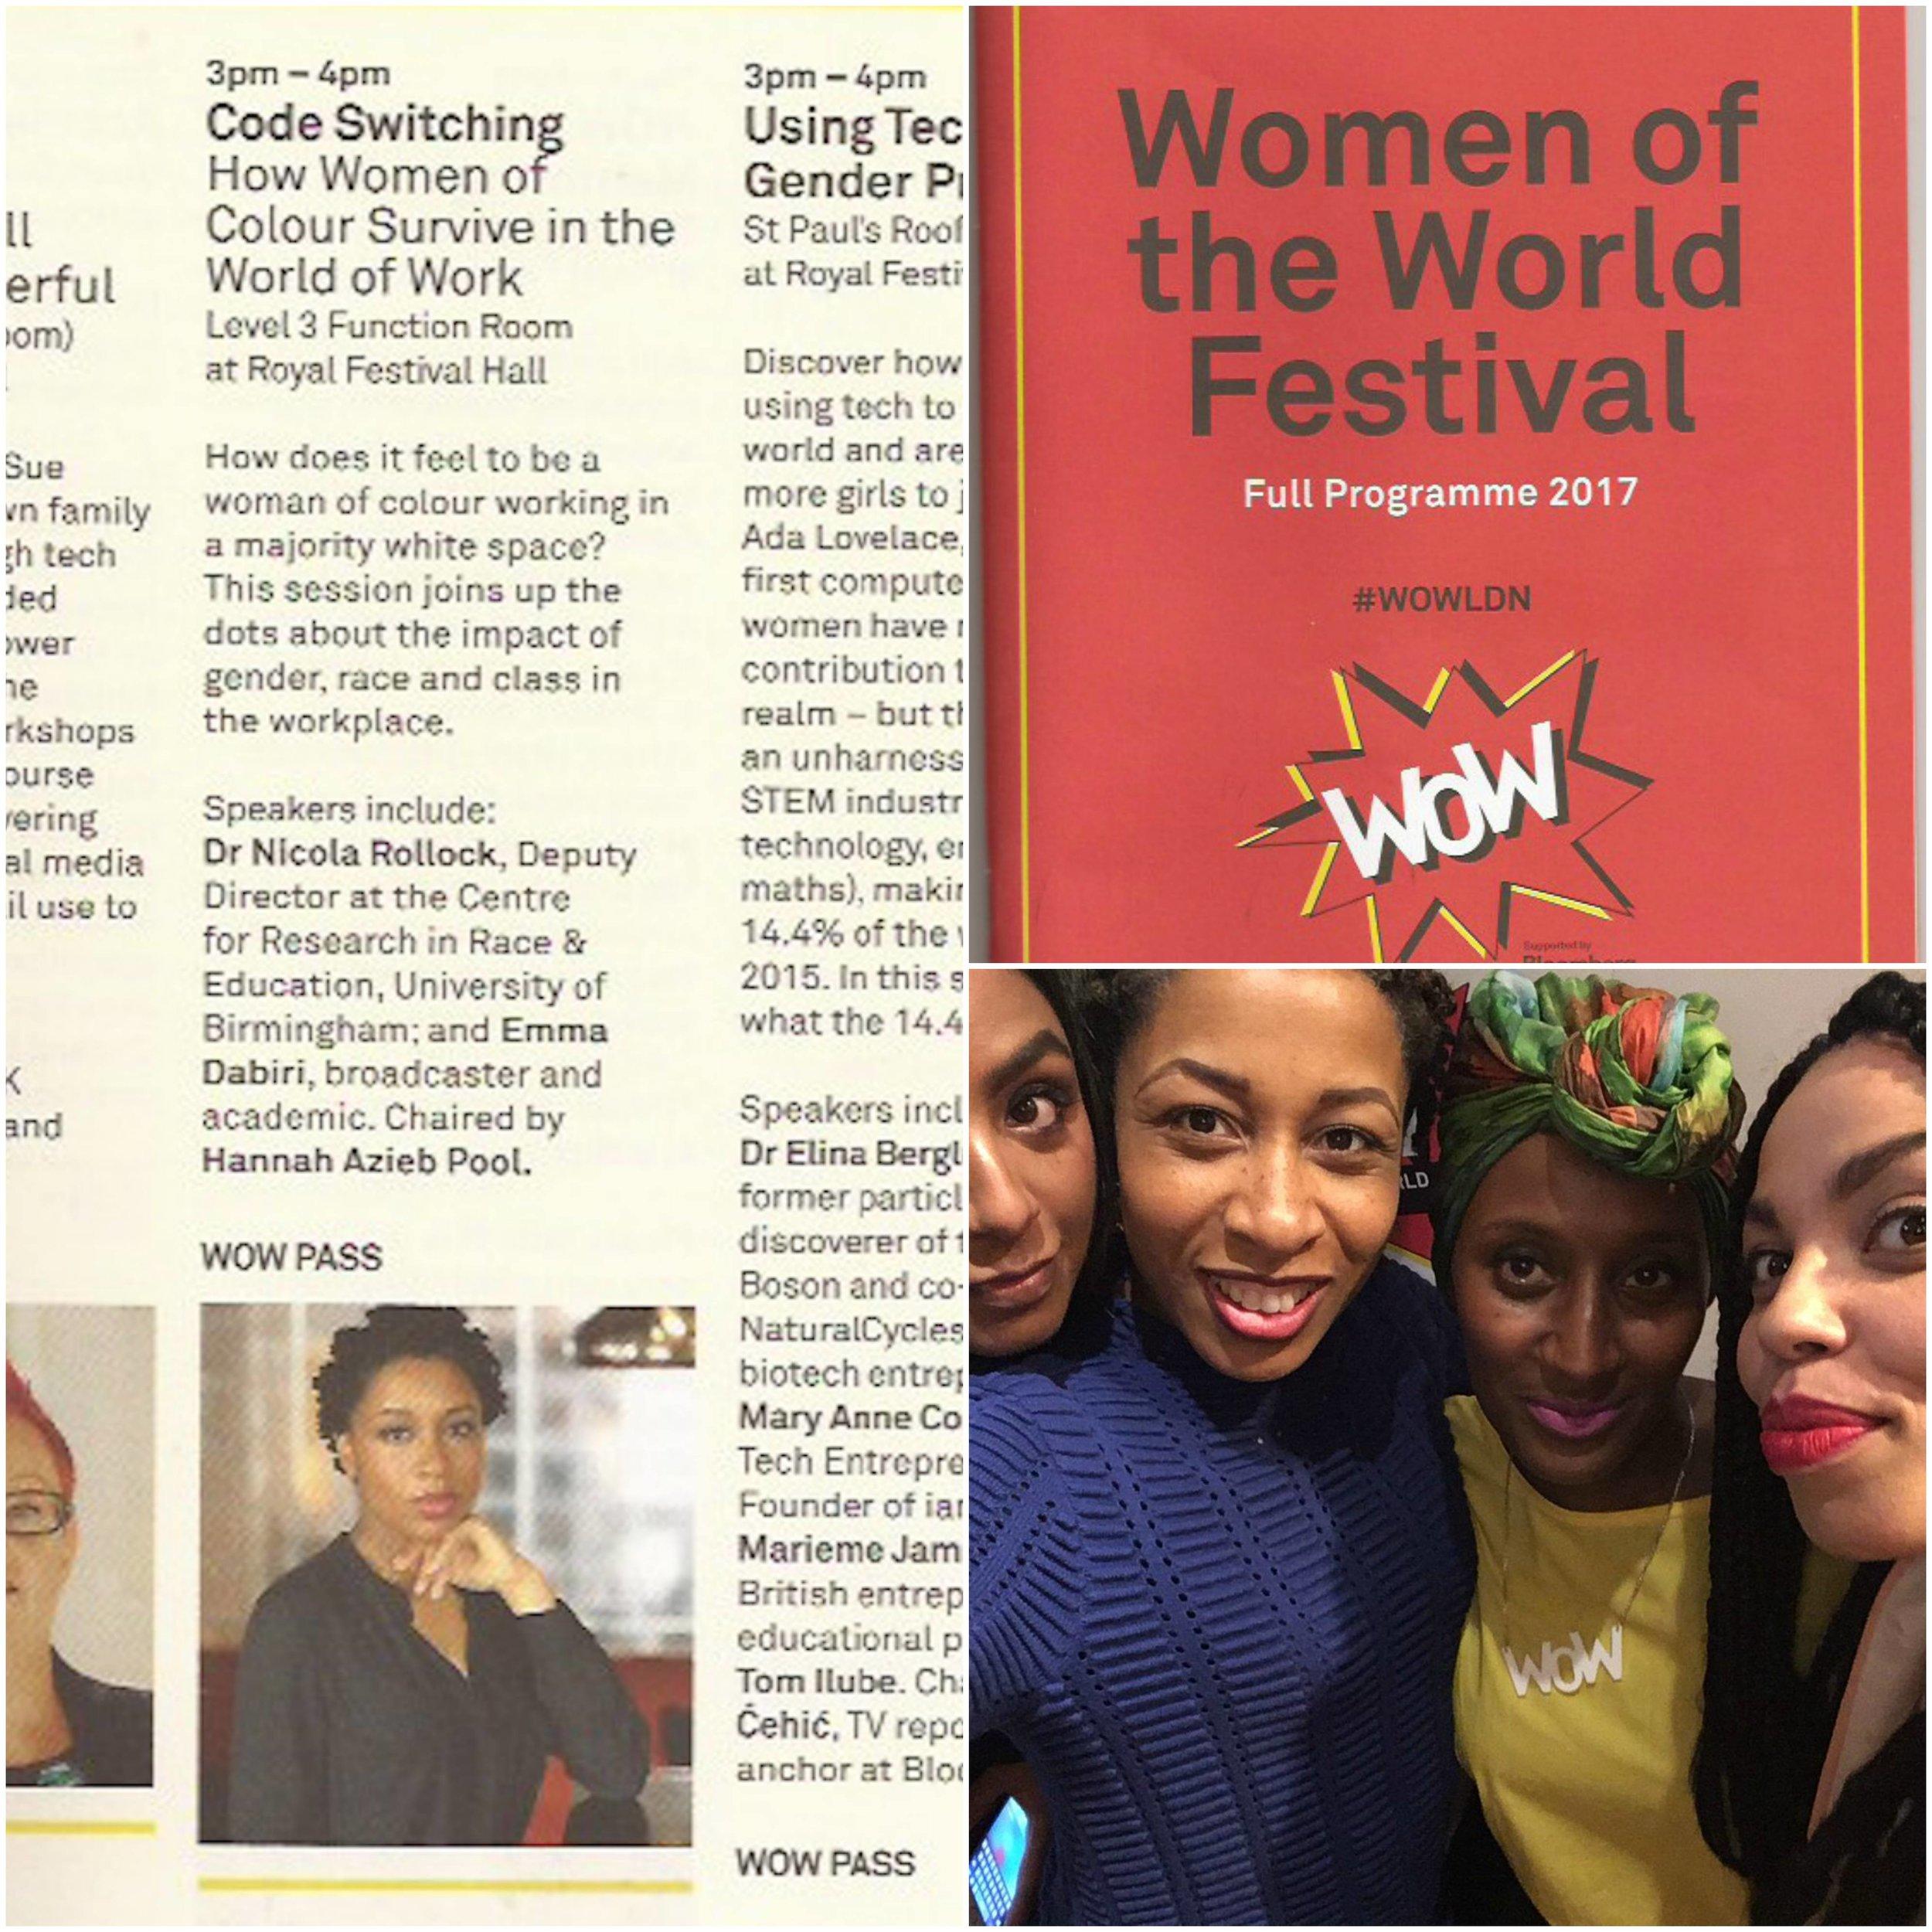 Speaking at the W.O.W London Festival (photo: Anita Bhagwandas, Hannah Azieb Pool, Emma Dabiri (March 2017)